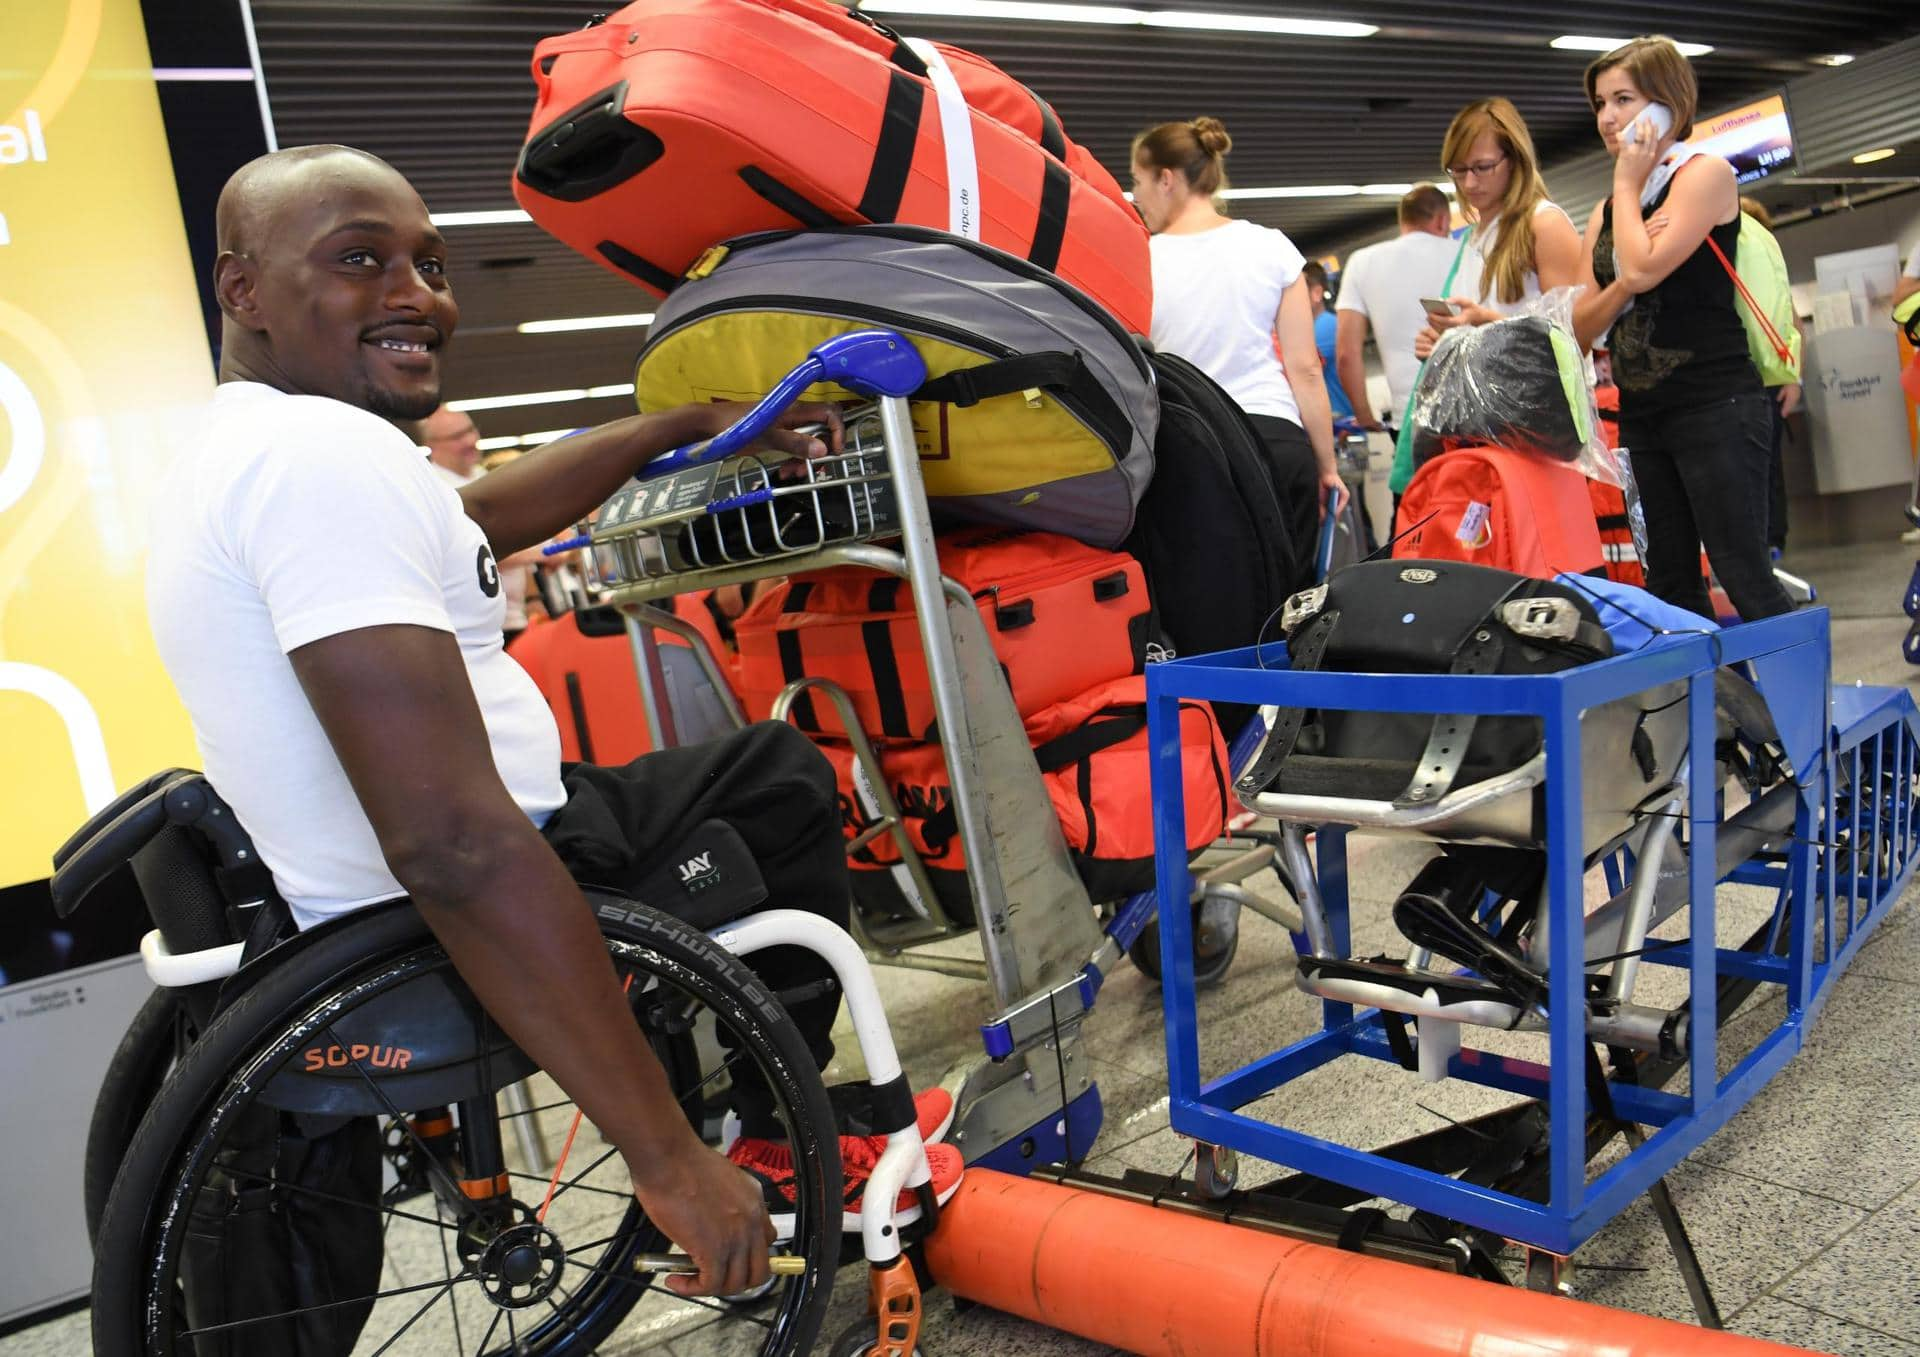 Gemischte Gefühle: «Olympia hat gezeigt: Es funktioniert» Paralympics in Tokio